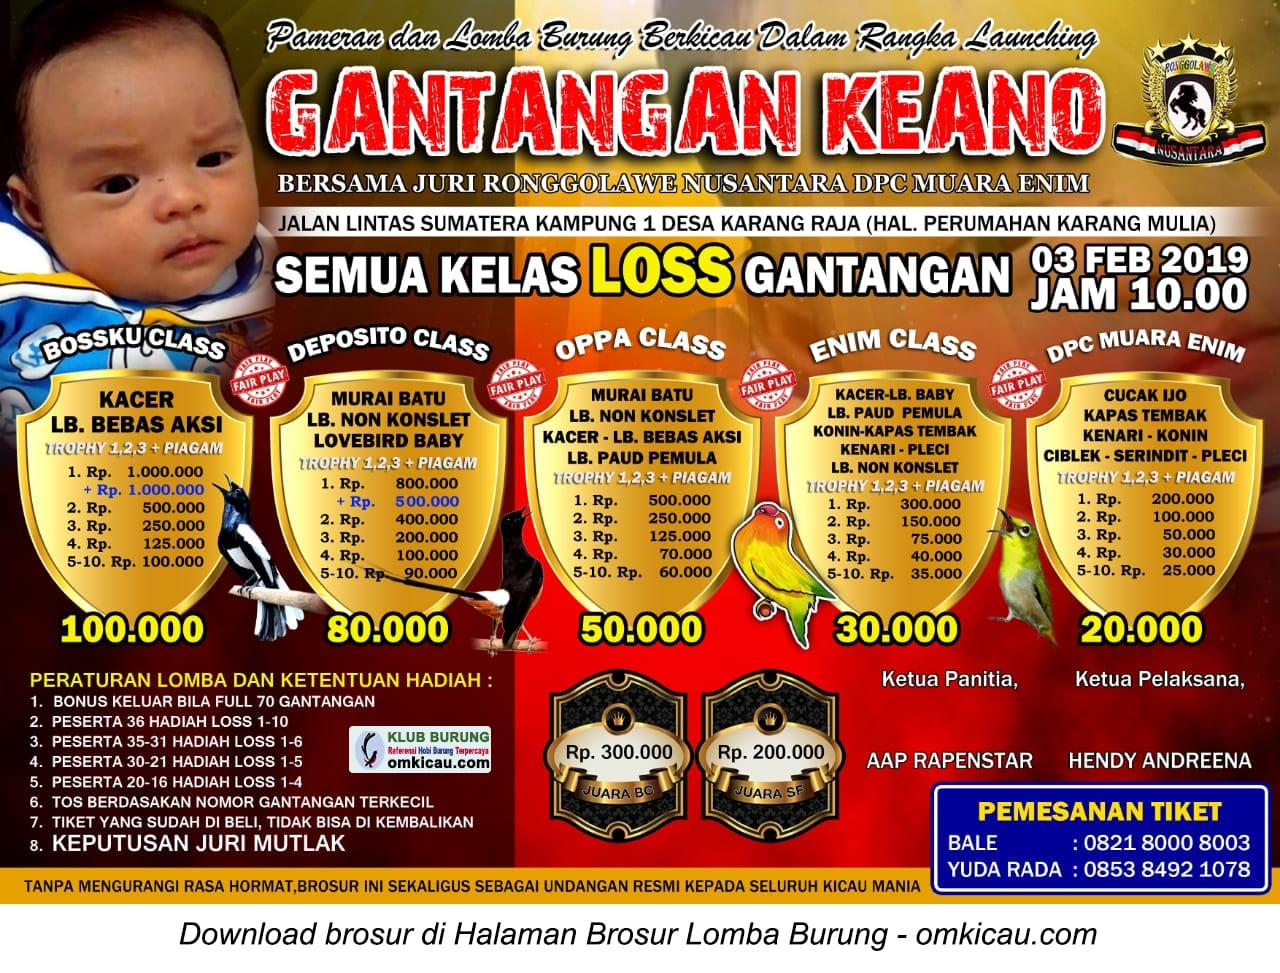 Launching Gantangan Keano